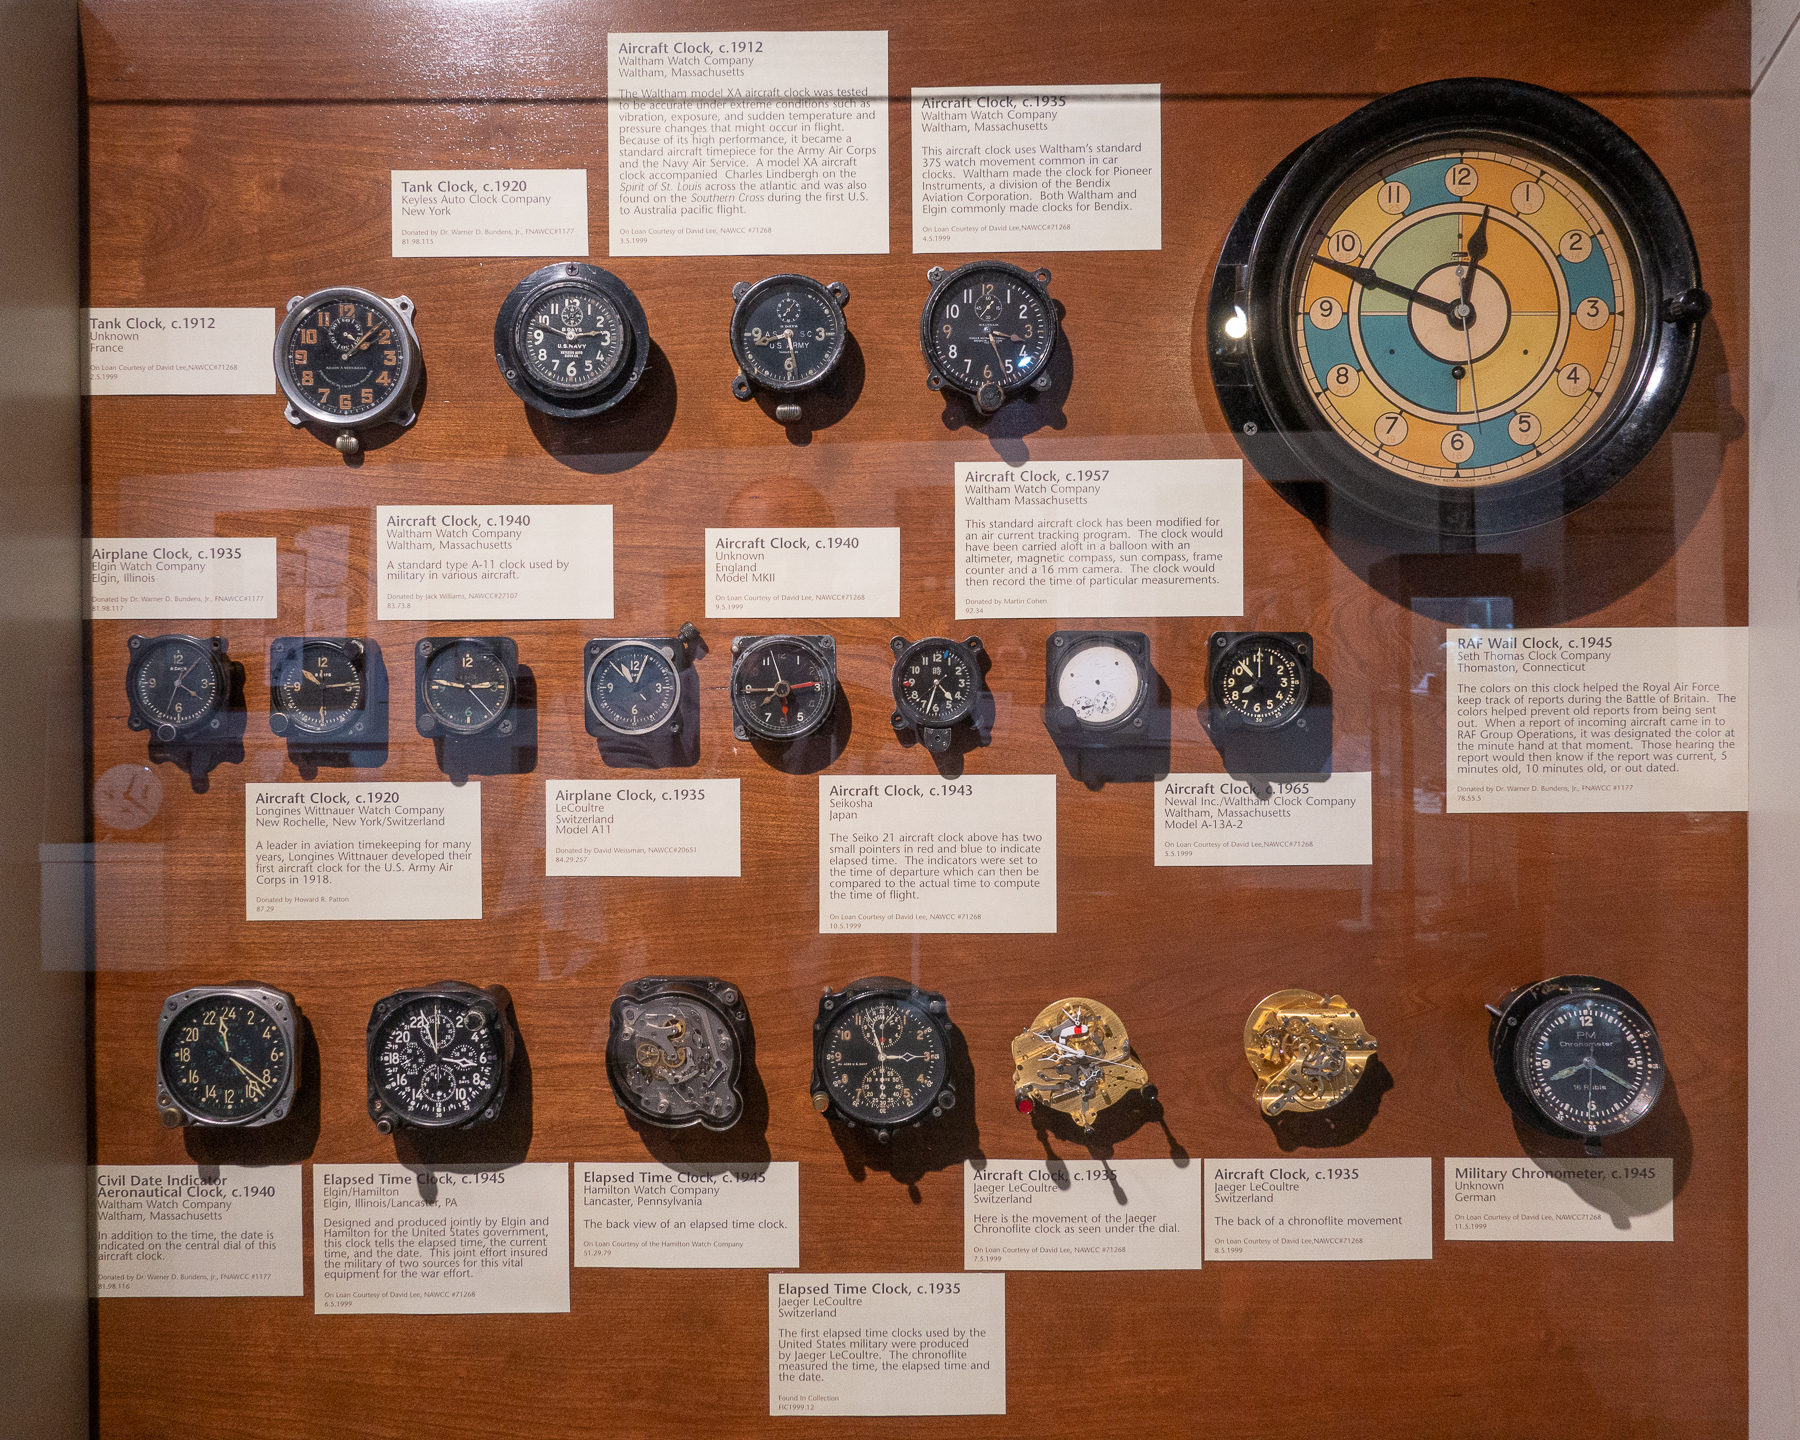 Aircraft Clocks